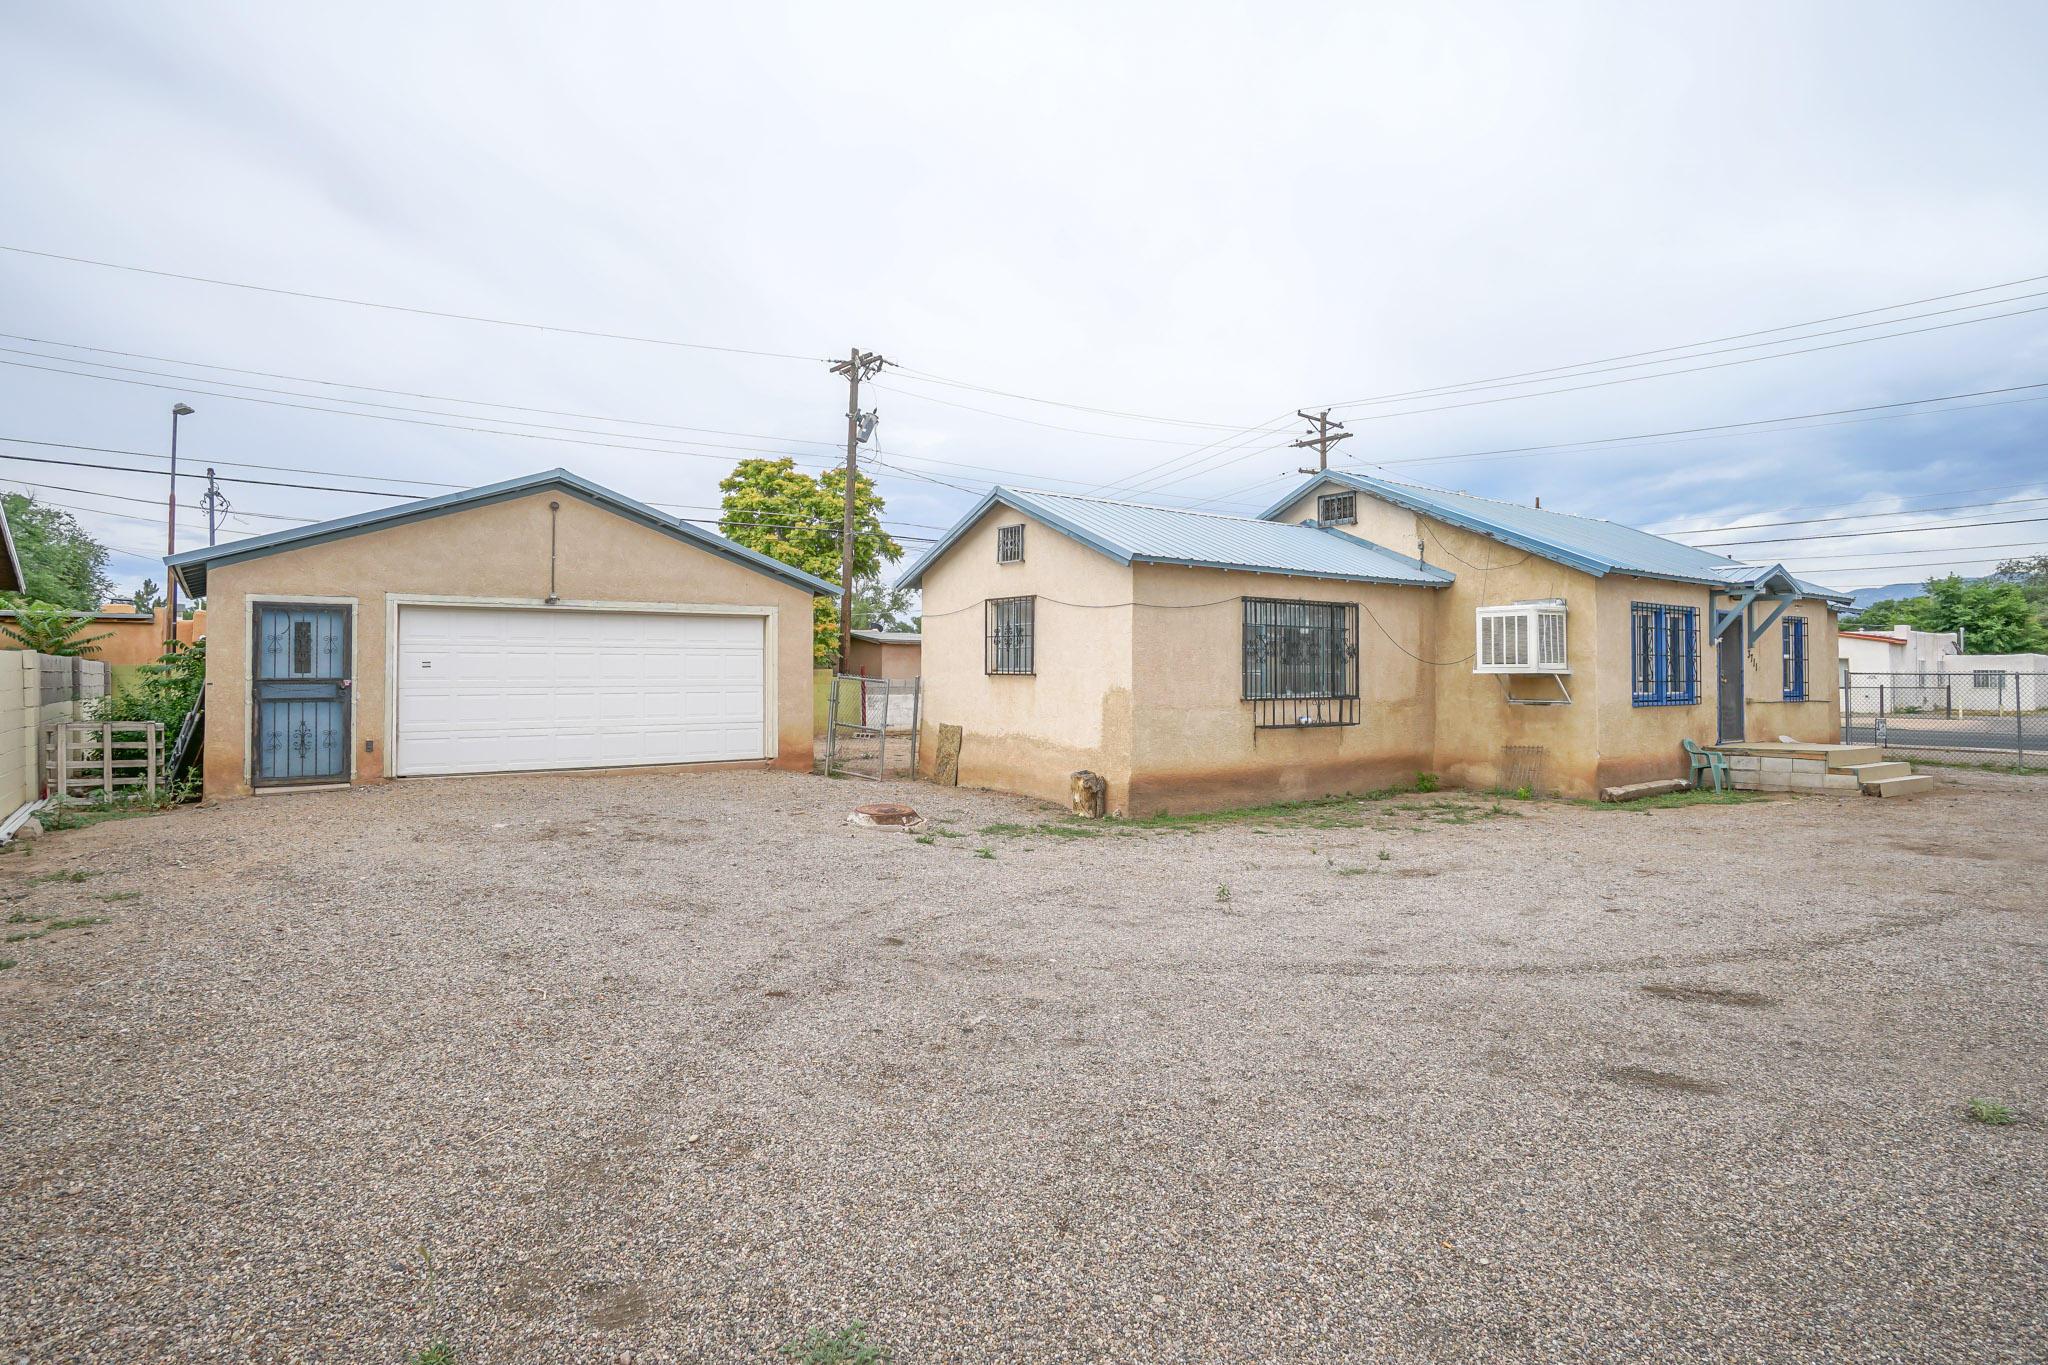 Photo of 3711 12Th Street NW, Albuquerque, NM 87107